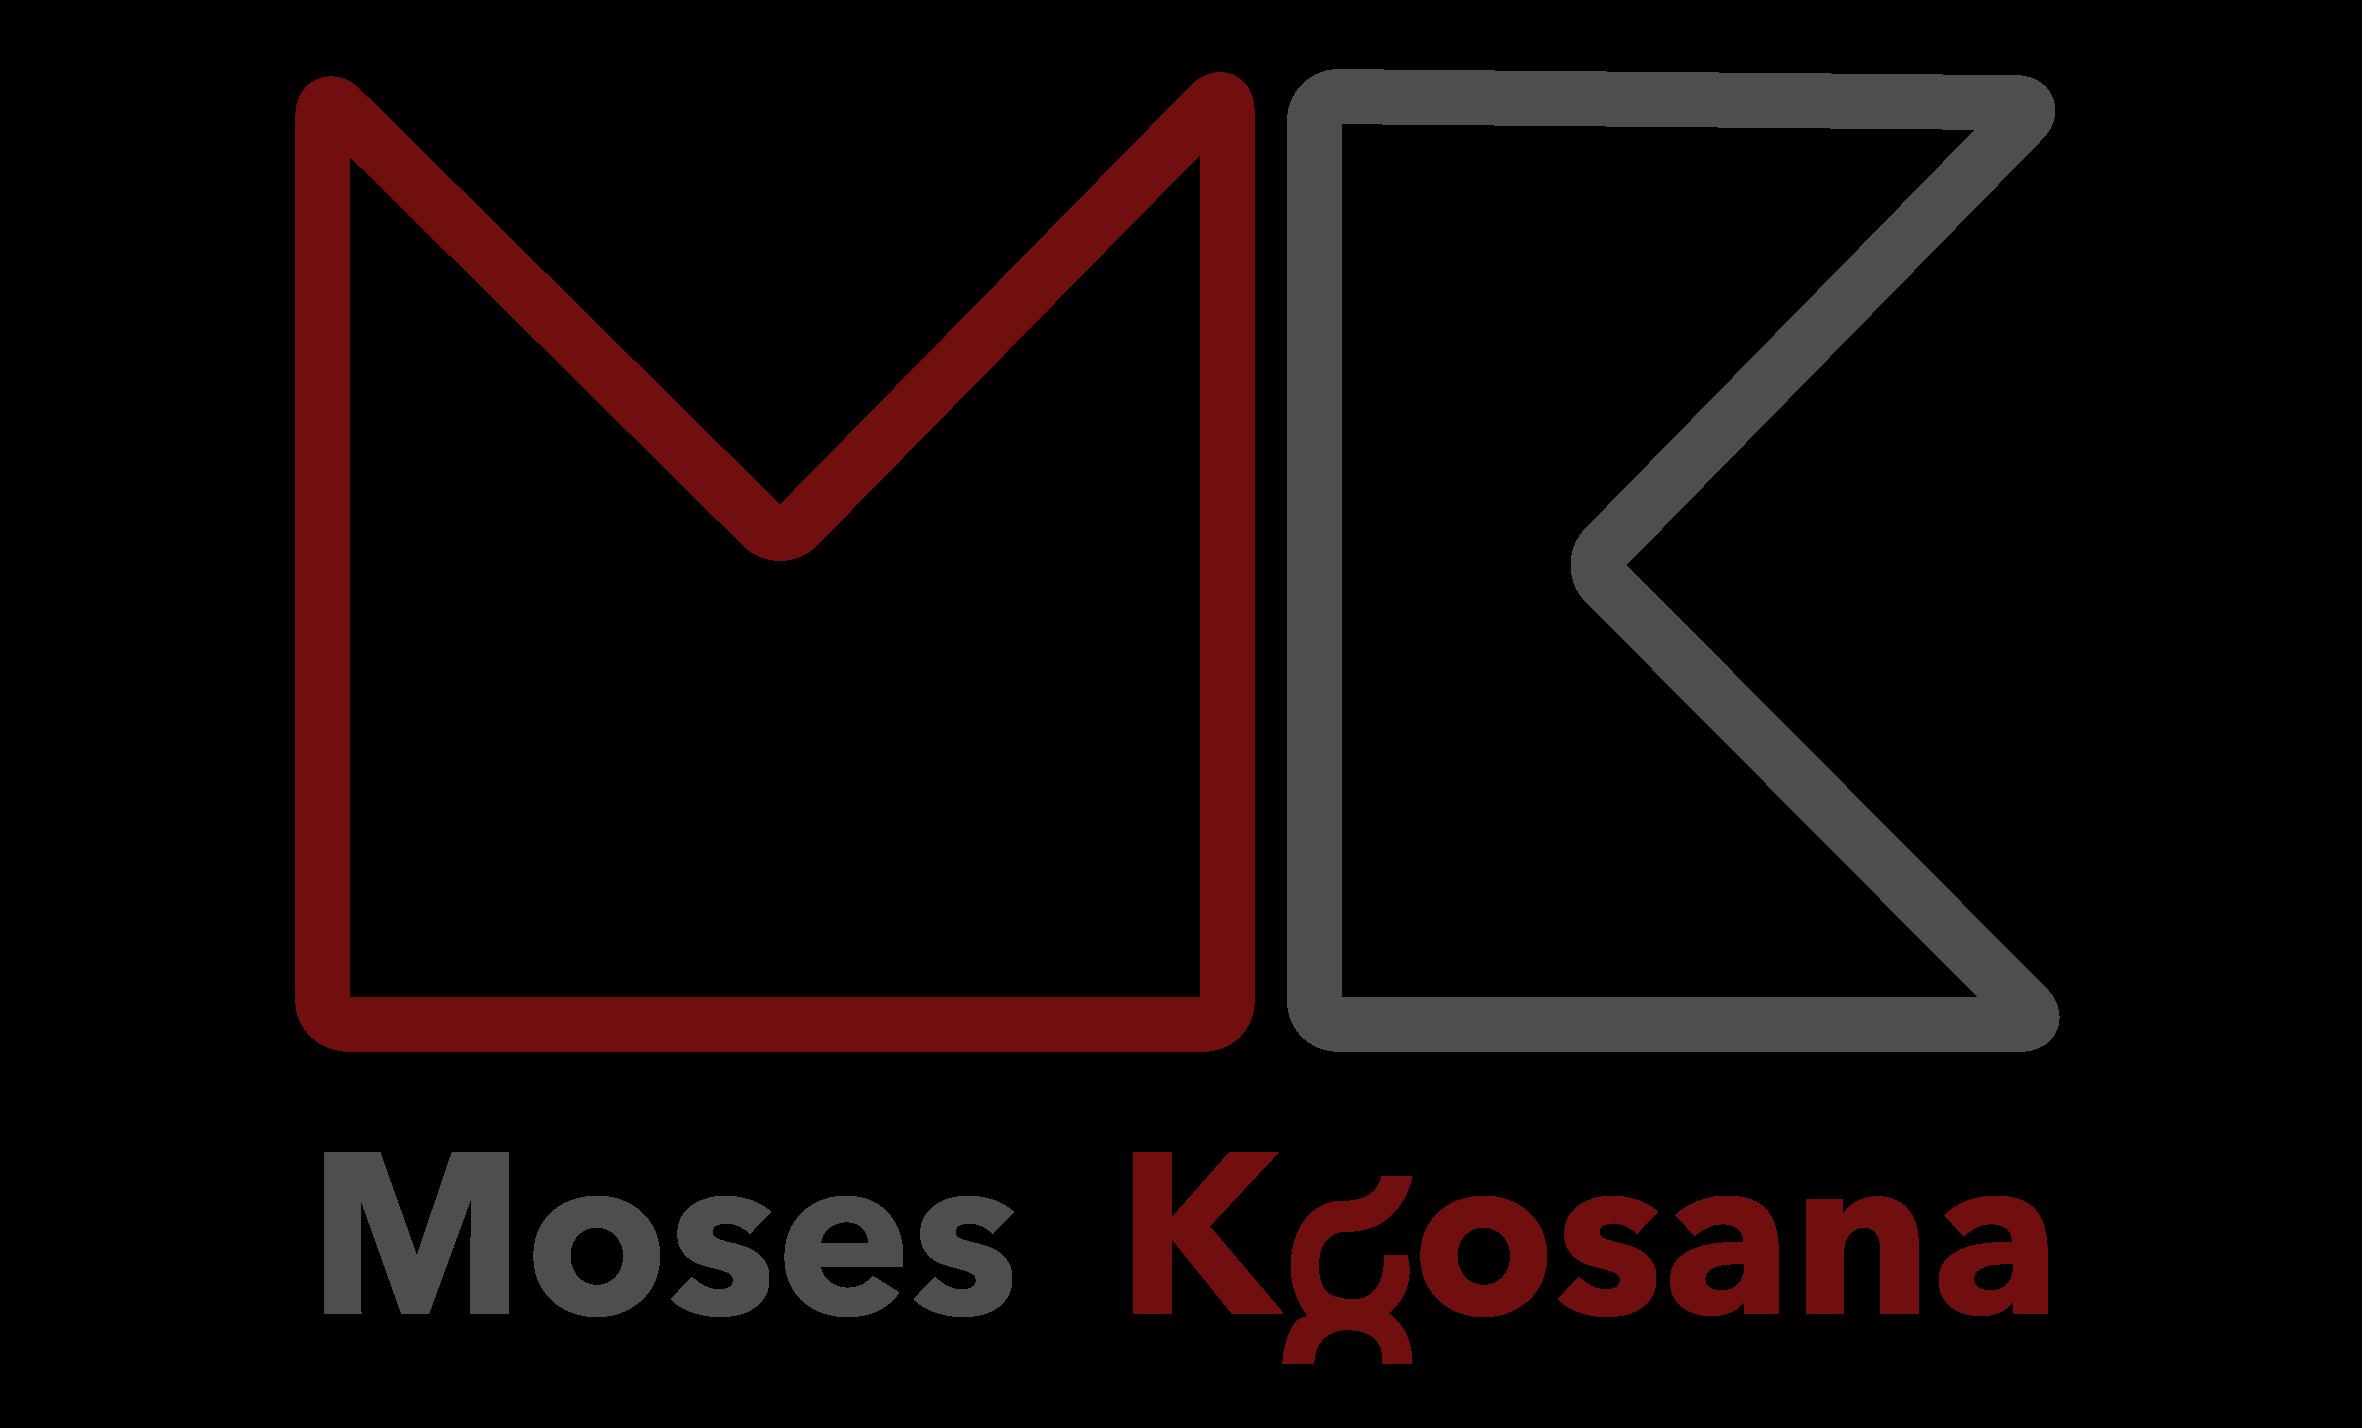 Moses Kgosana